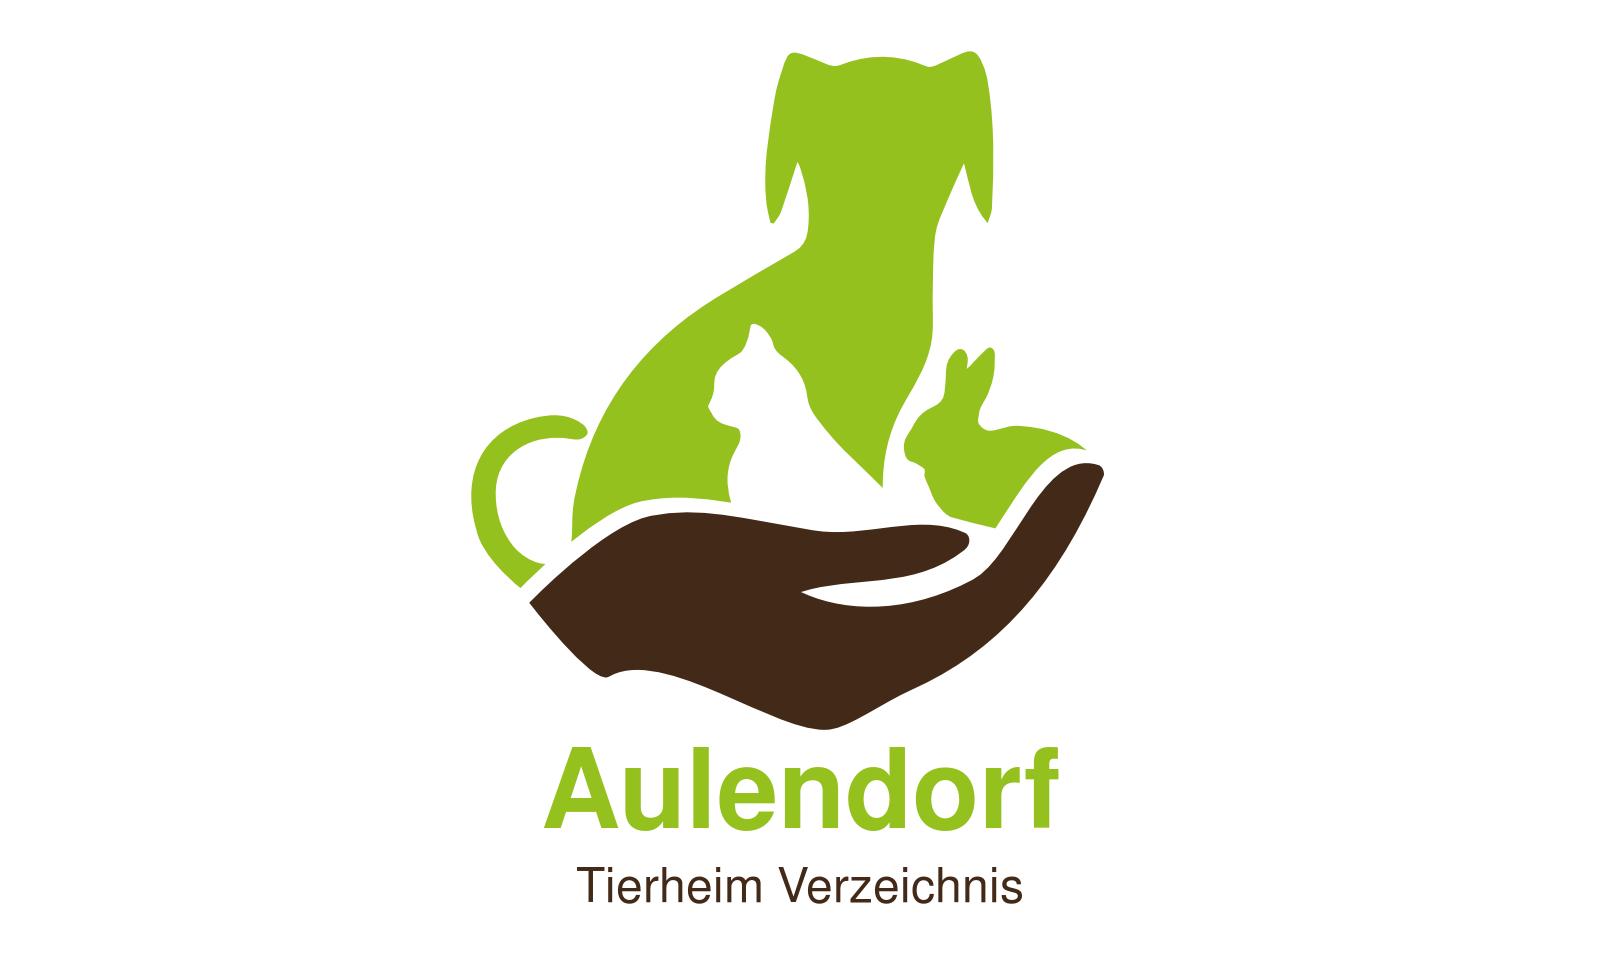 Tierheim Aulendorf